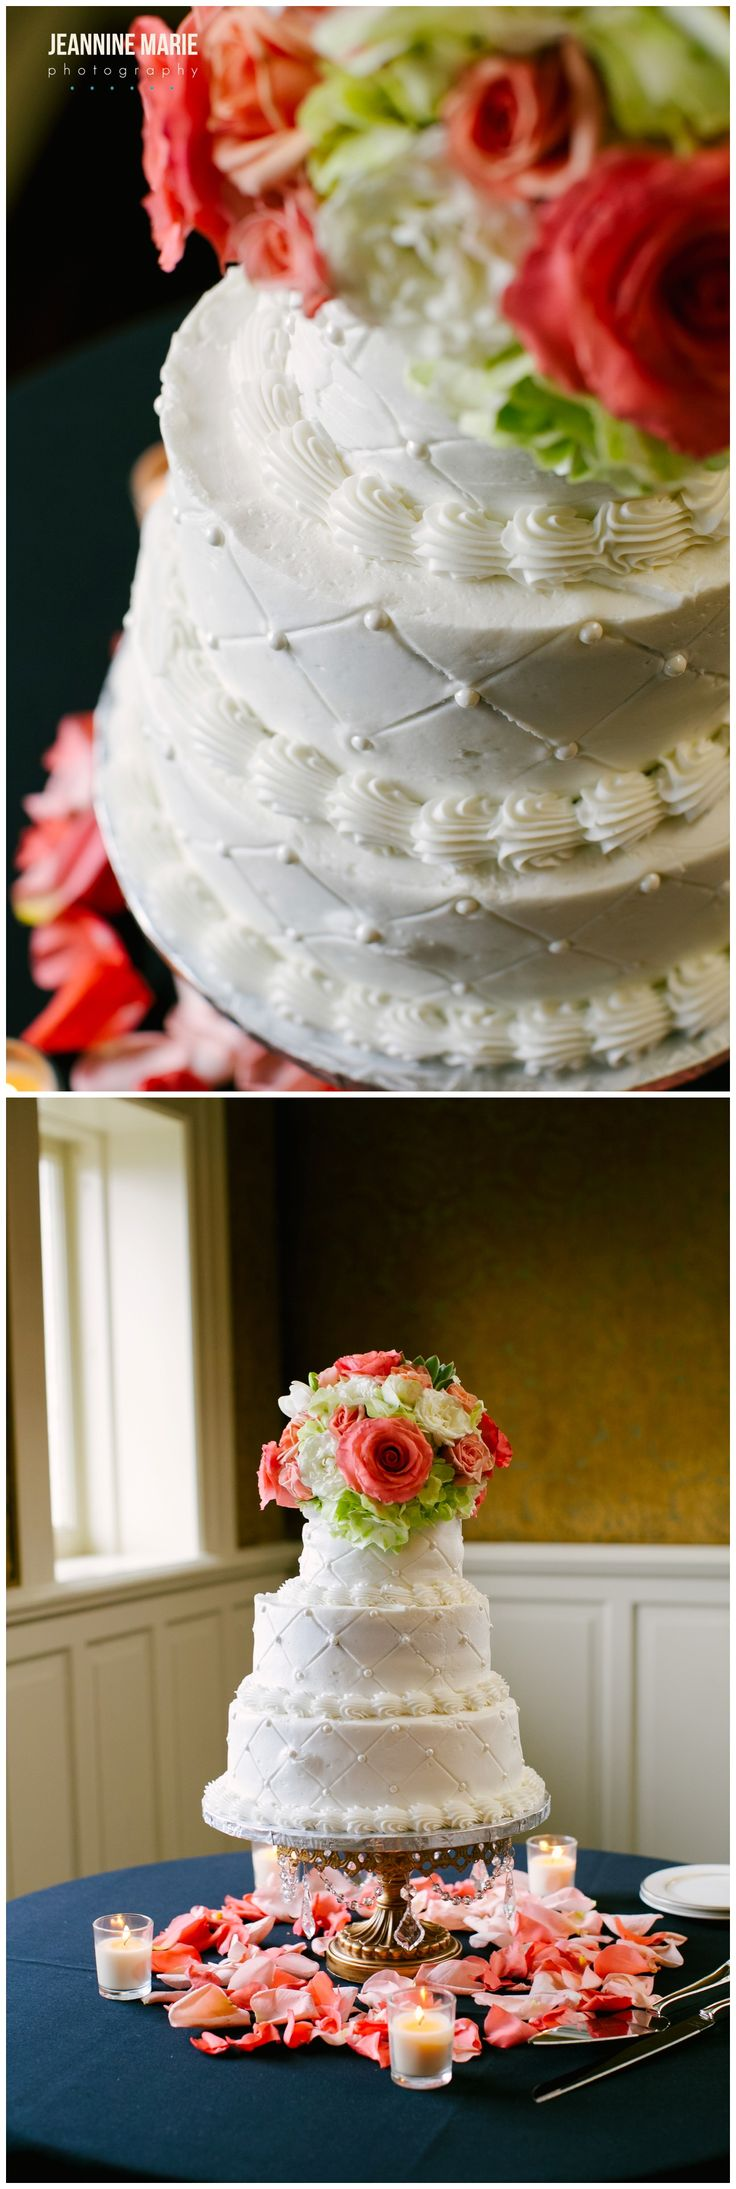 mansion weddings pinterest wedding cake designs and wedding cake